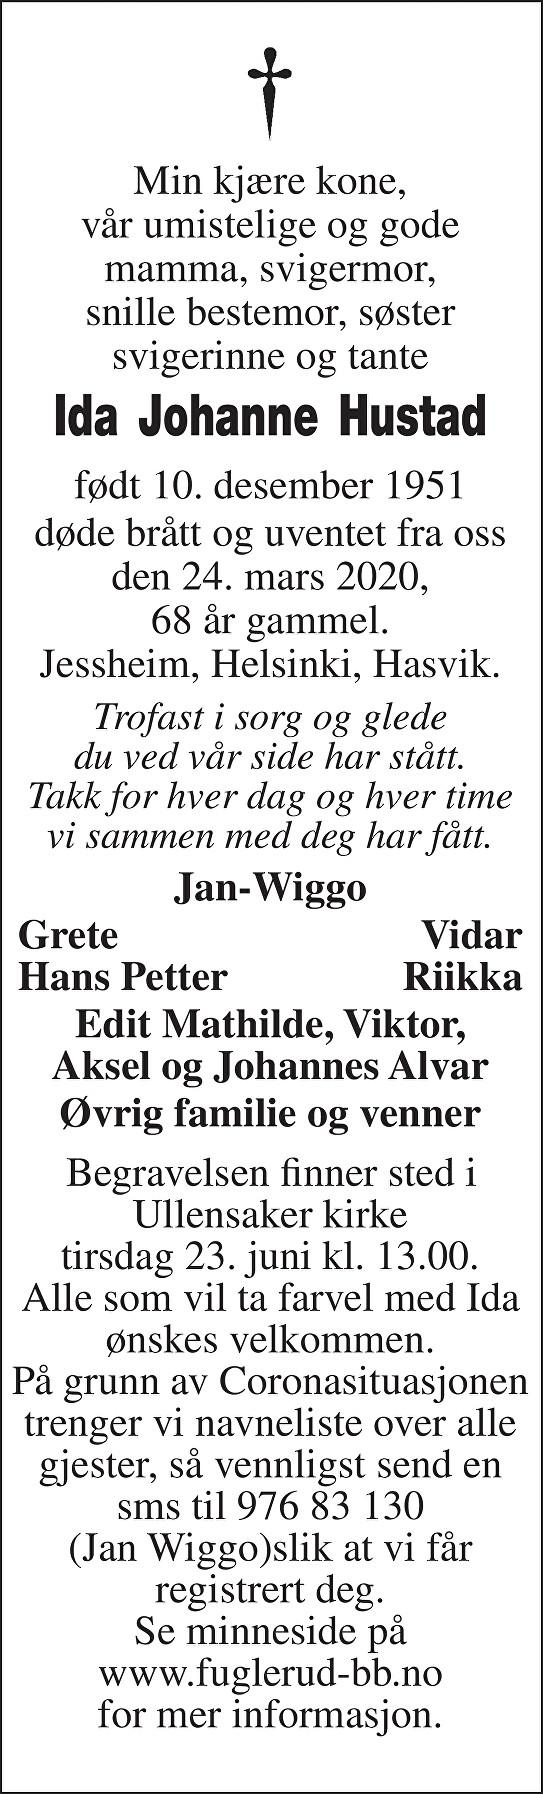 Ida Johanne Hustad Dødsannonse